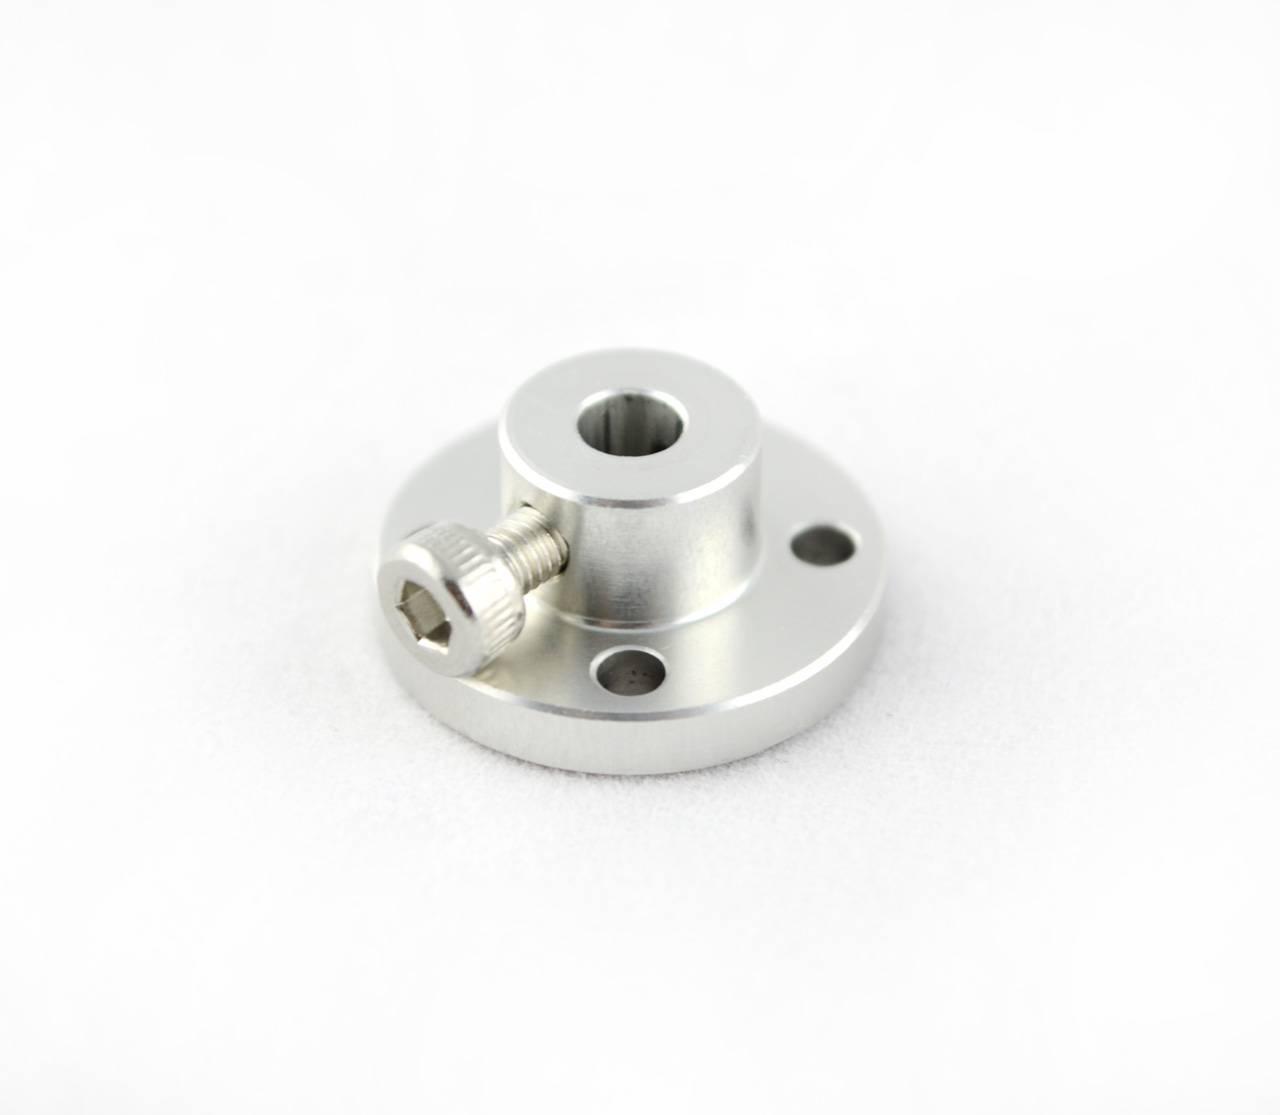 4mm Aluminum Hub for 48mm Aluminum Omni Wheel 18023